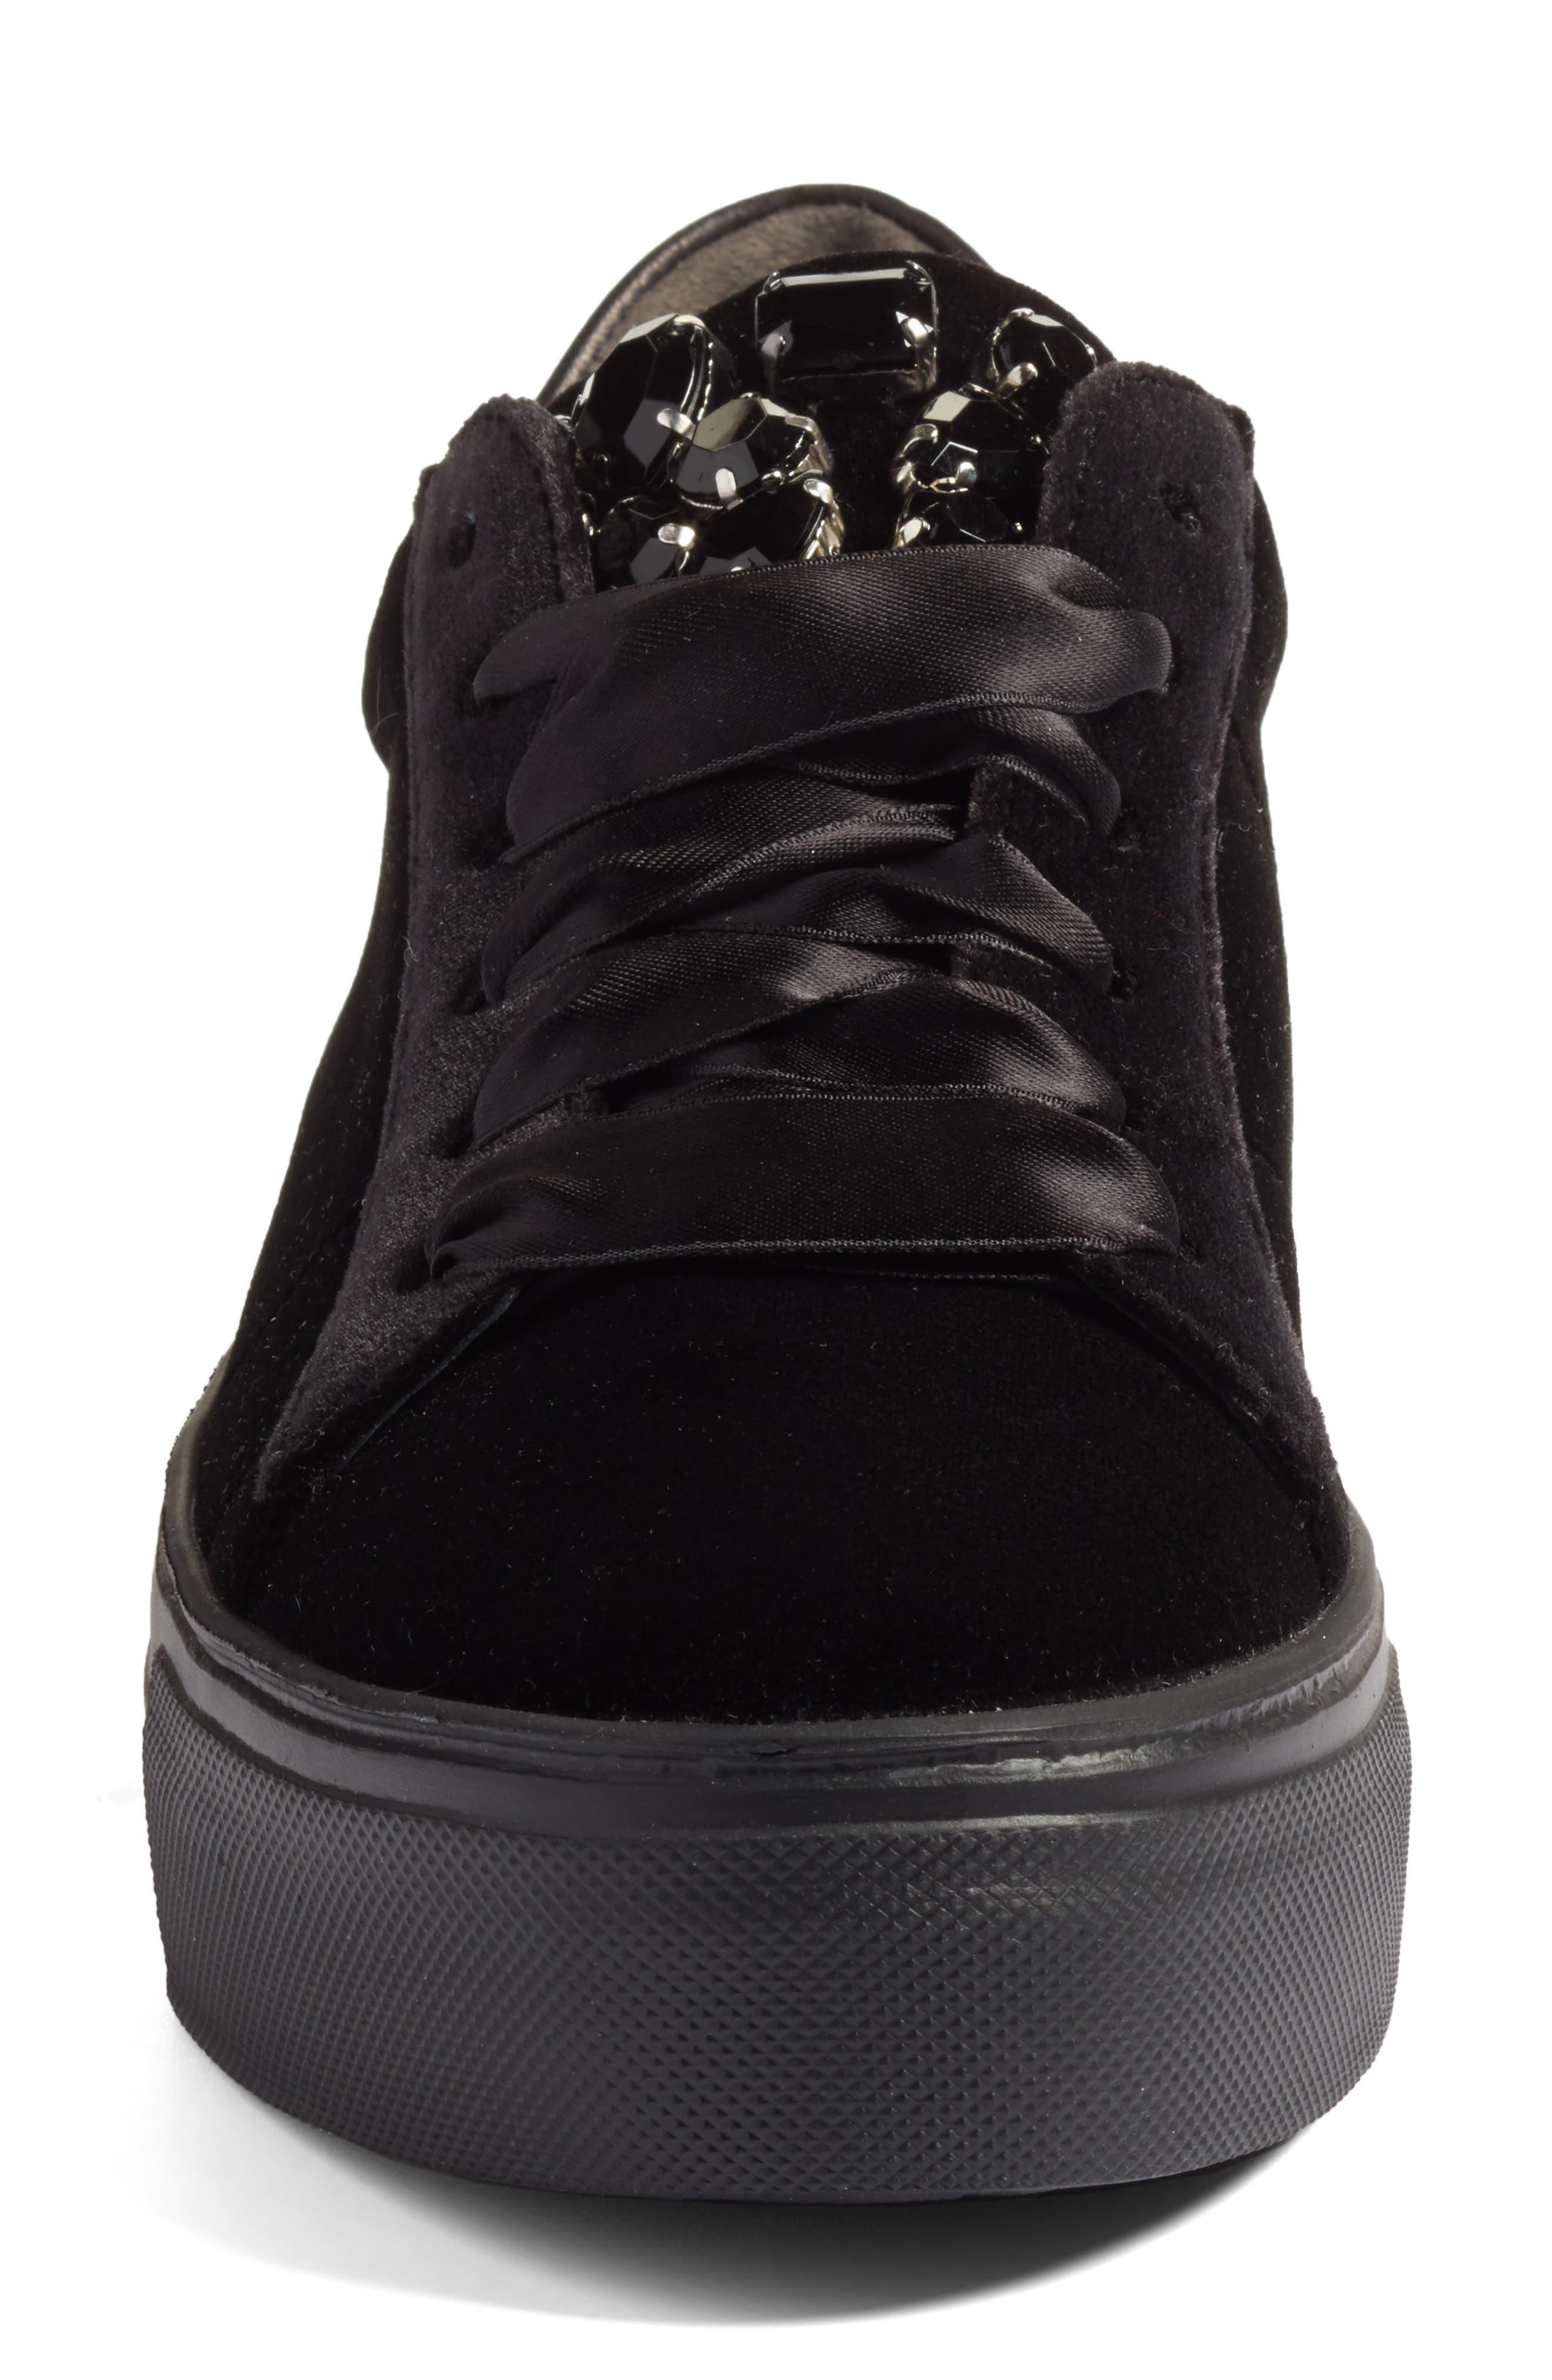 Kennel & Schmenger Big Velvet Lace-Up Sneaker,                             Alternate thumbnail 4, color,